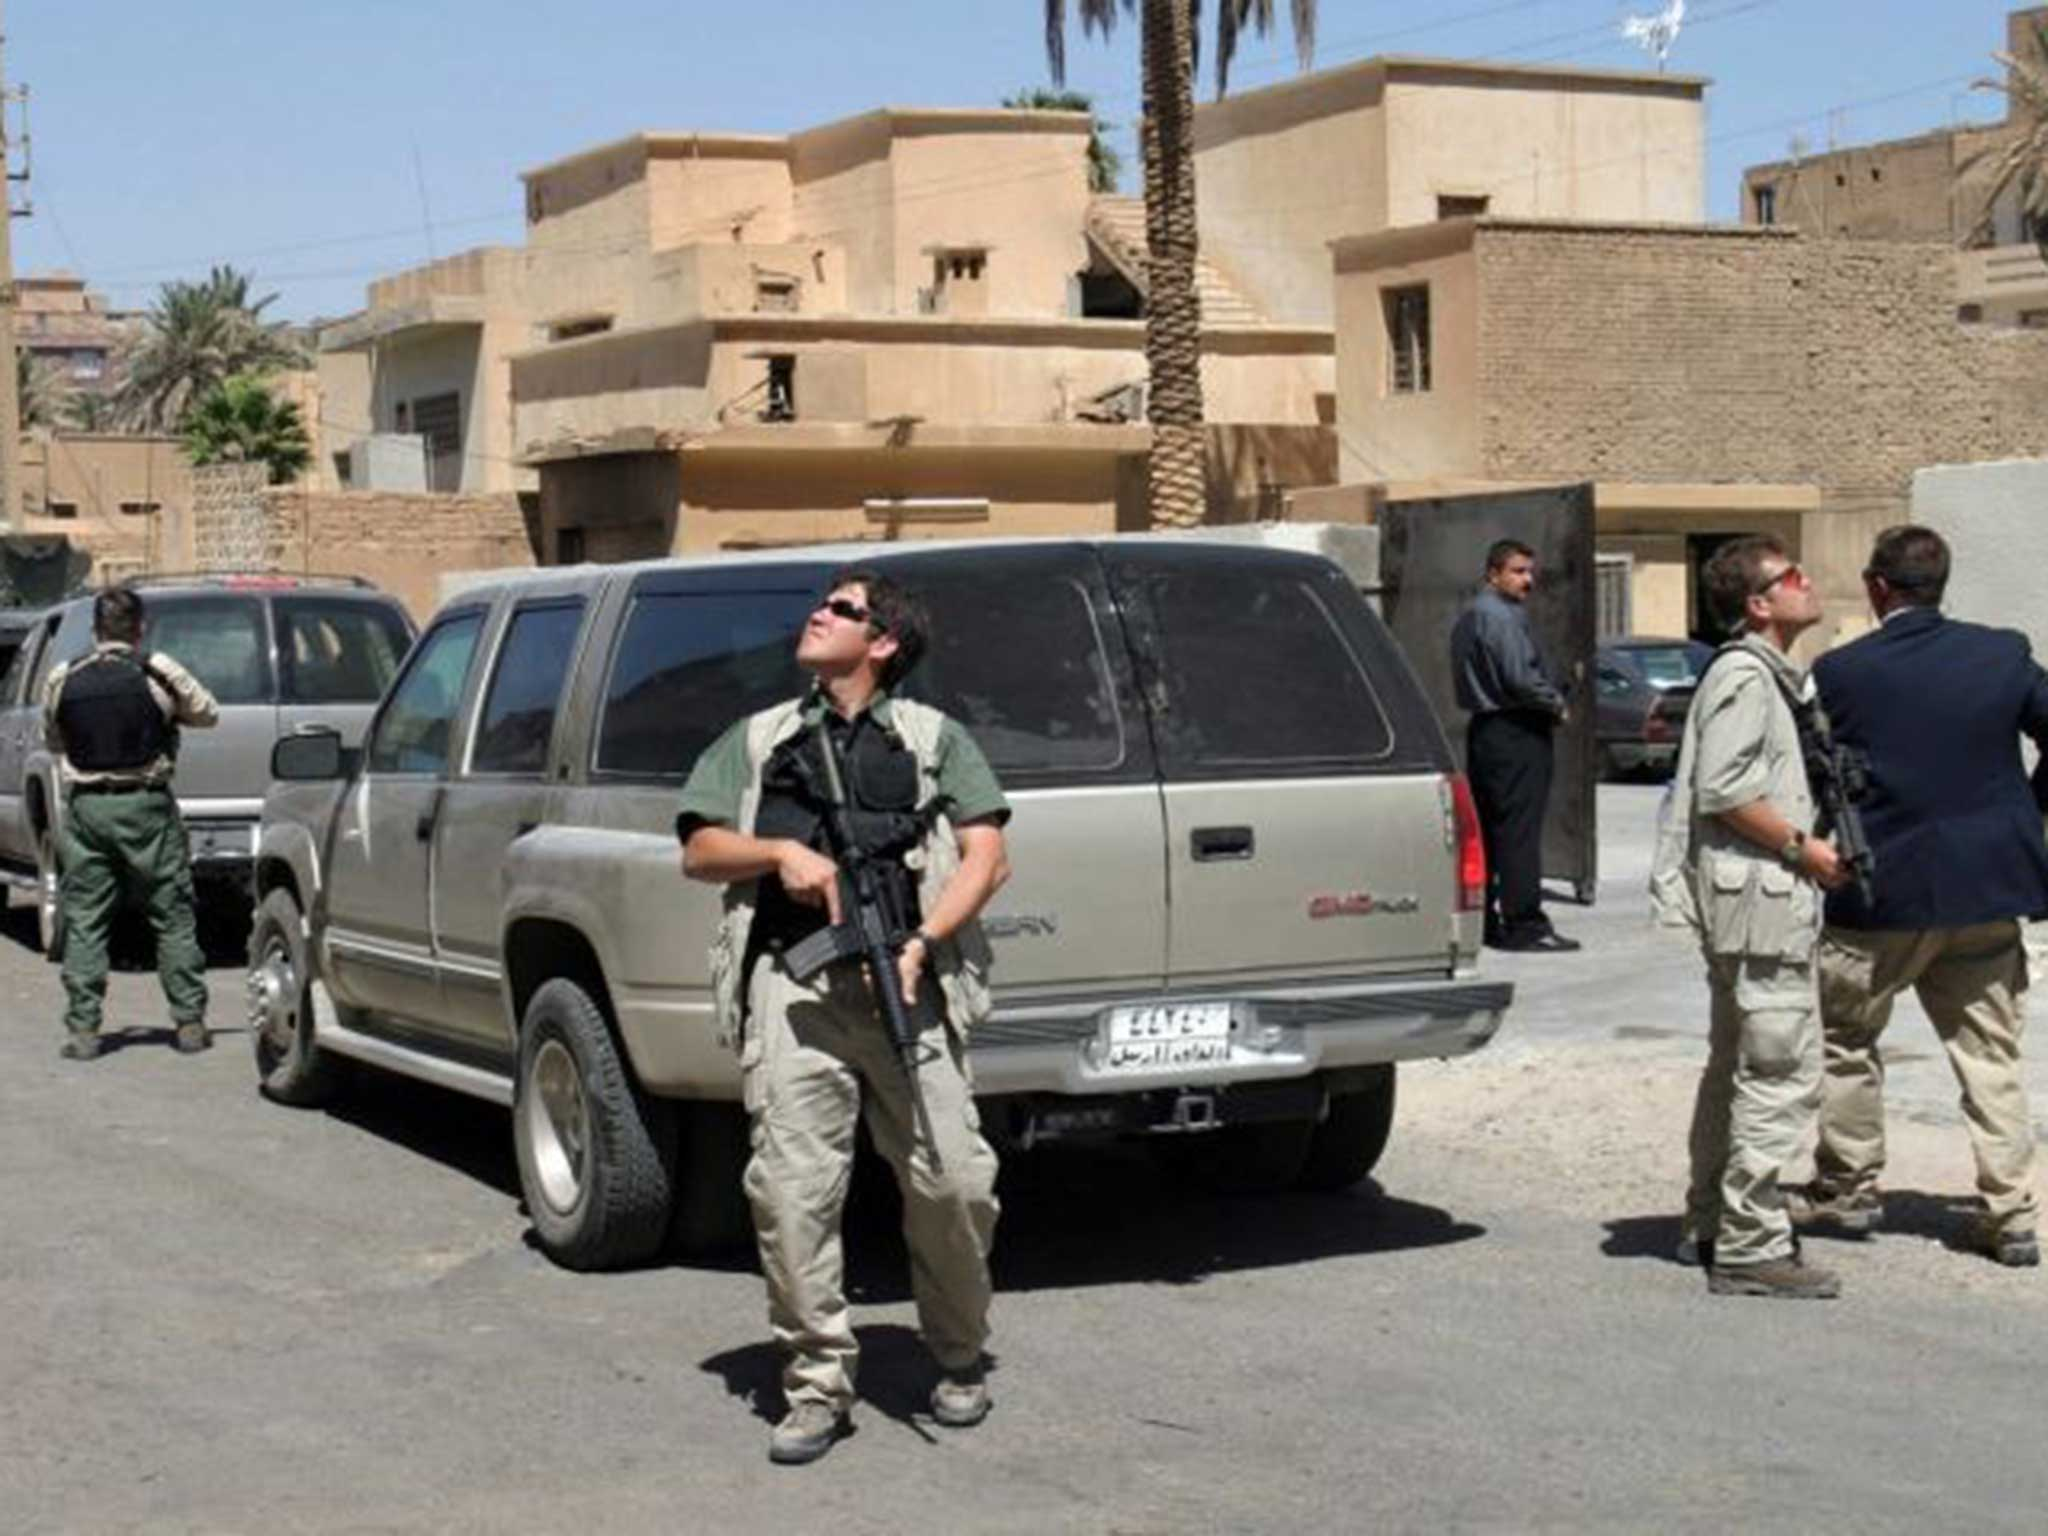 blackwater mercenaries face justice for bloodbath in baghdad that